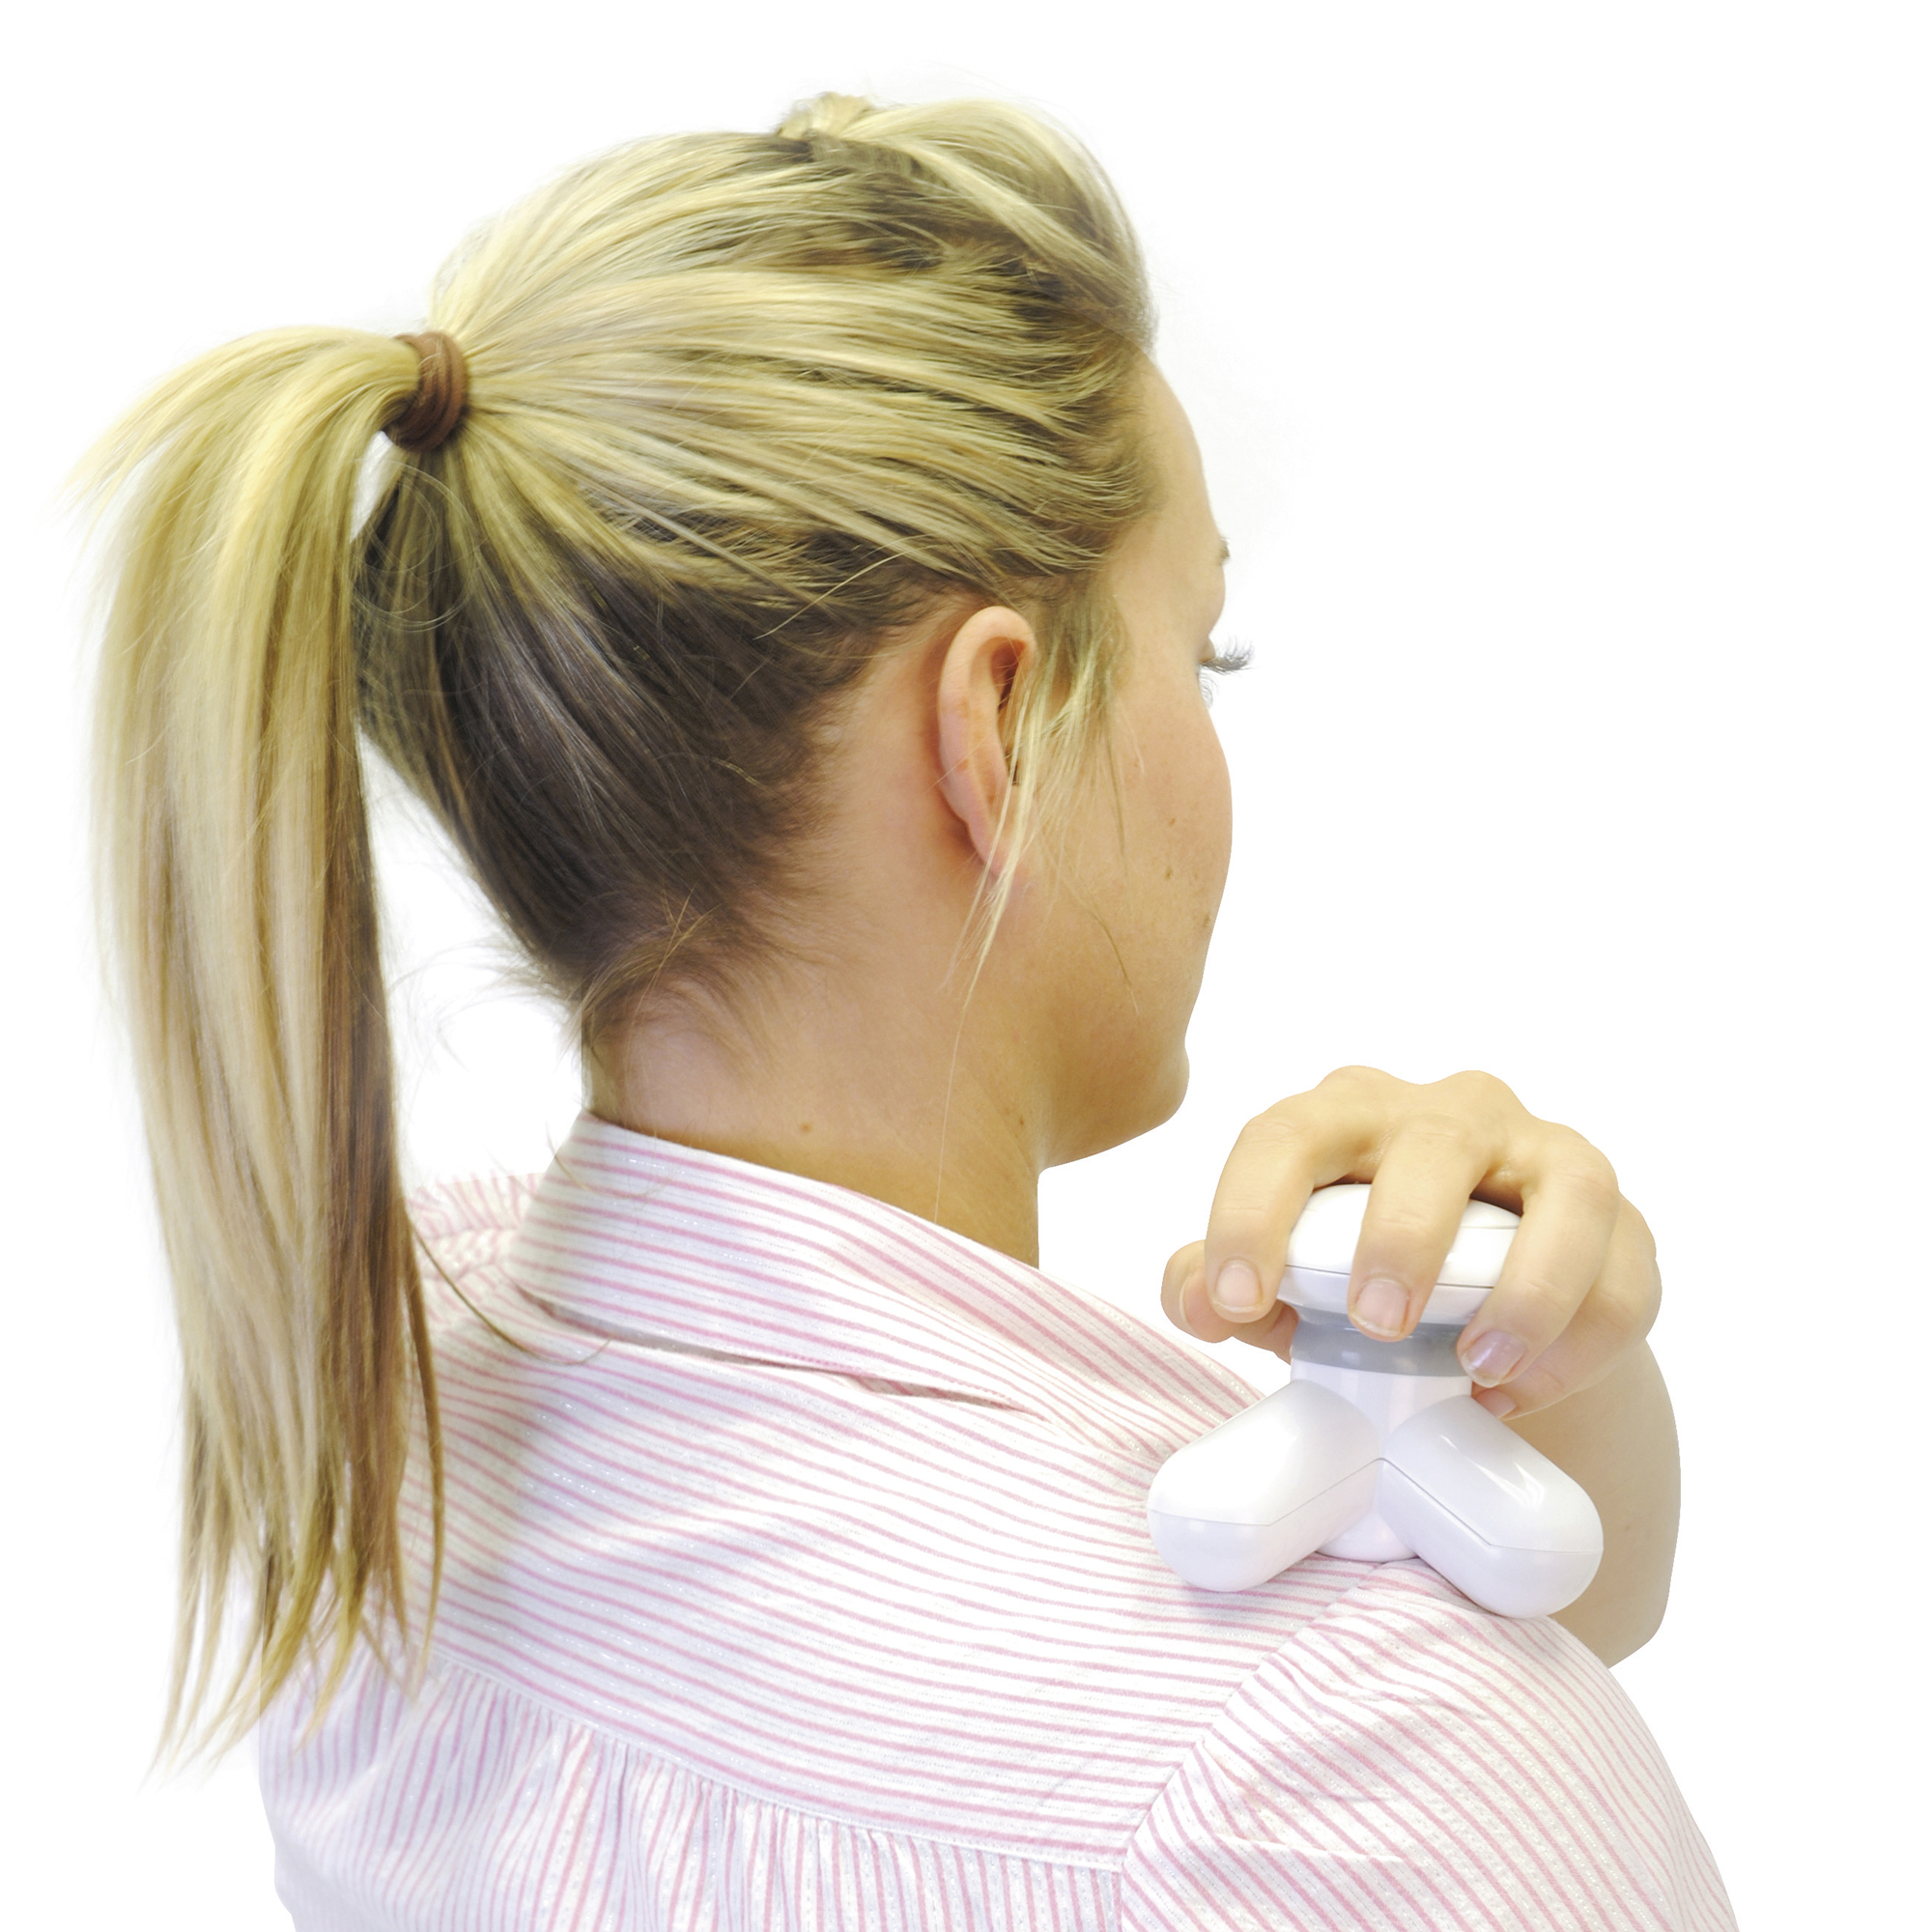 Promotional Voca Portable Massager